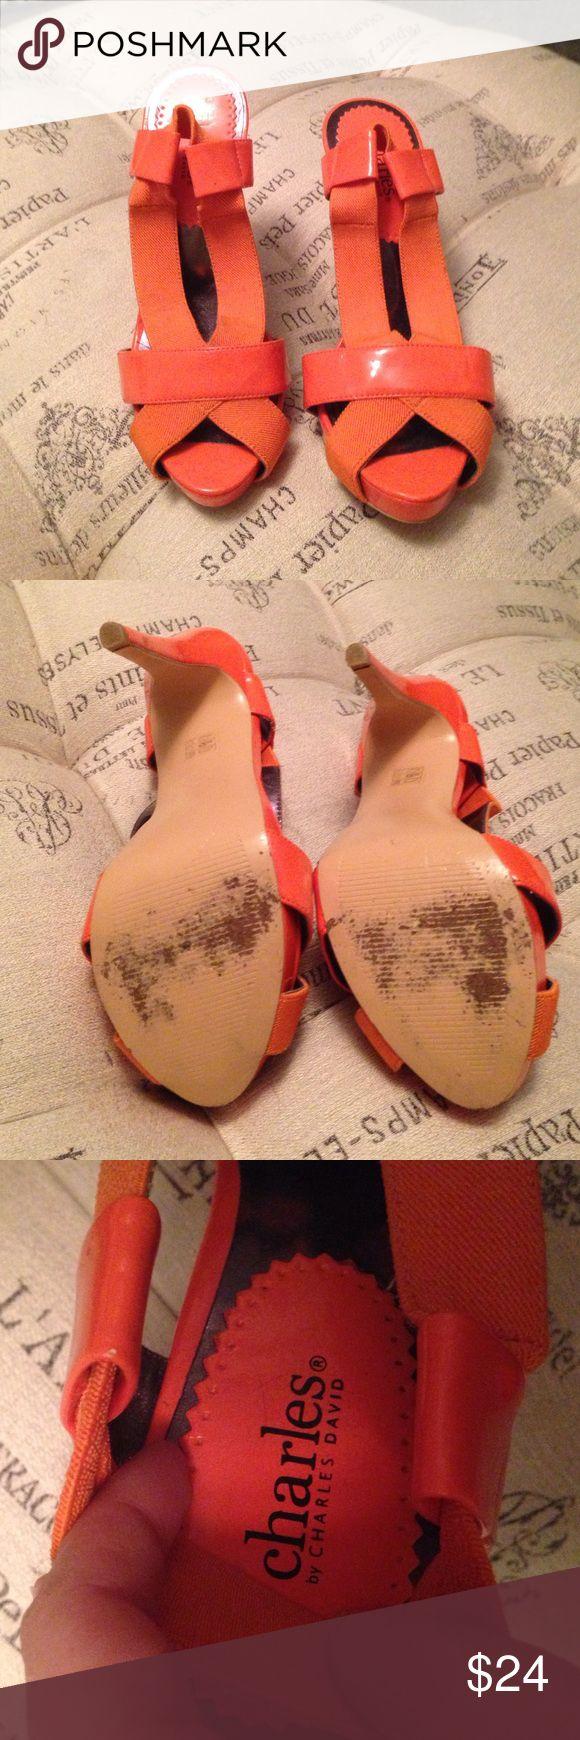 Charles David Orange heels size 7 Like new orange Charles David heels size 7. One small imperfection on heel. Charles David Shoes Heels